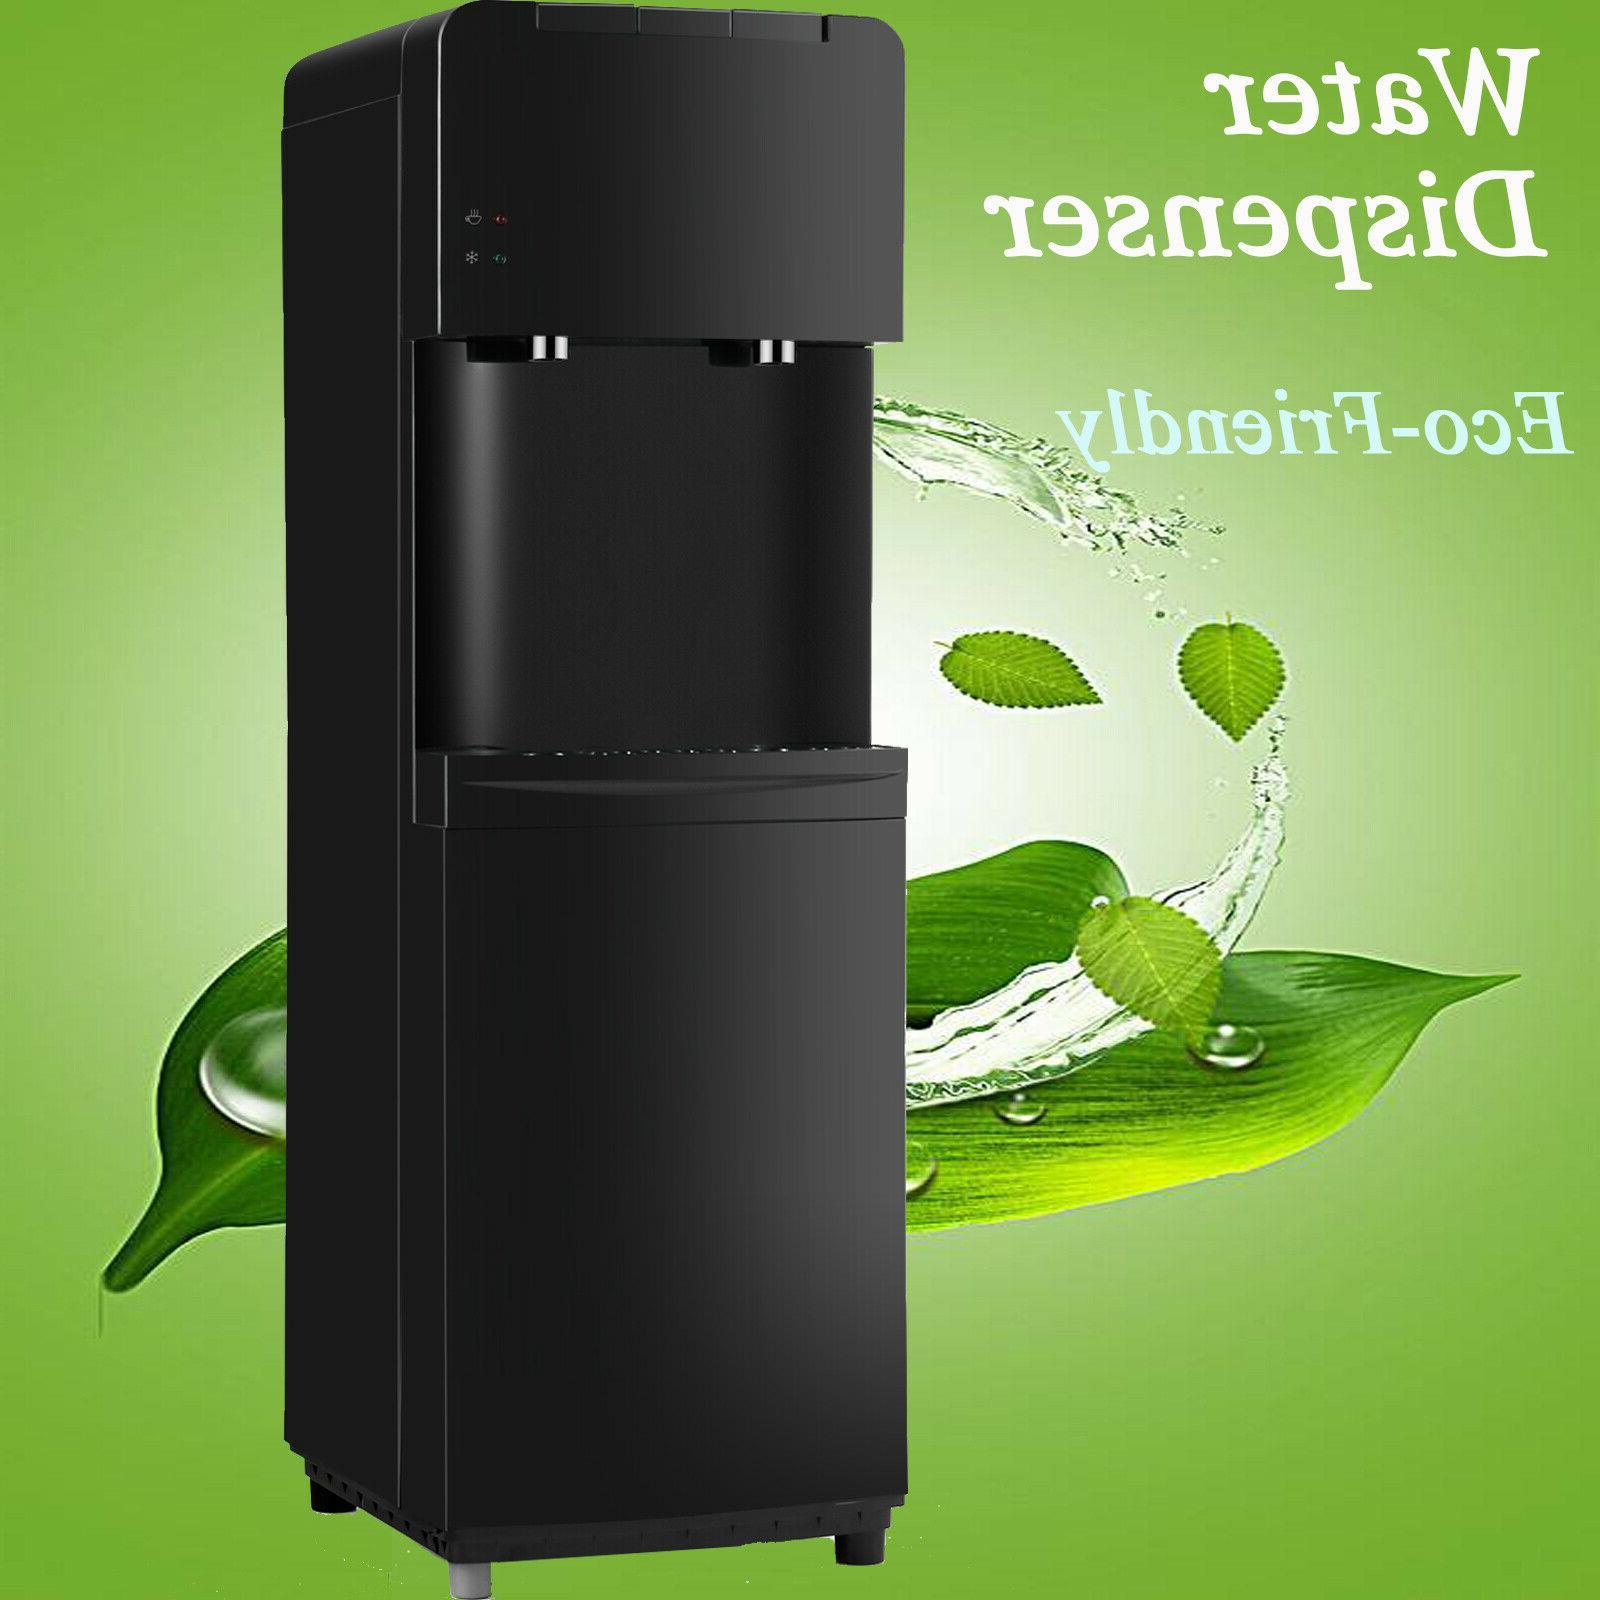 water cooler compressor refrigeration water dispenser hot